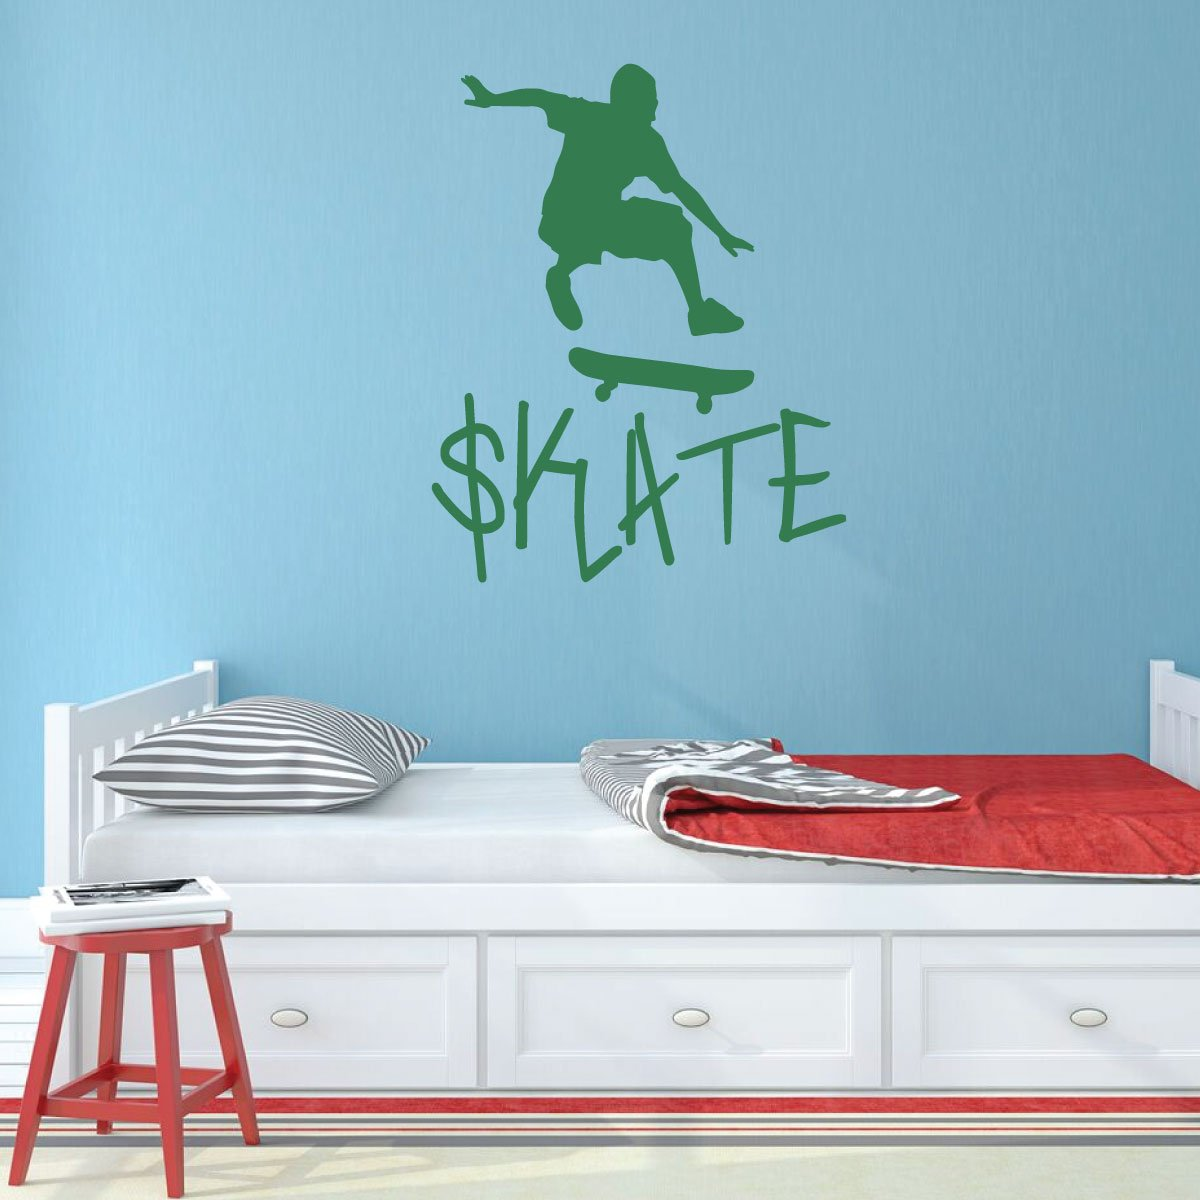 SKATEBOARD SKATER PERSONALIZED CUSTOM NAME Bedroom Vinyl Wall Decal Lettering